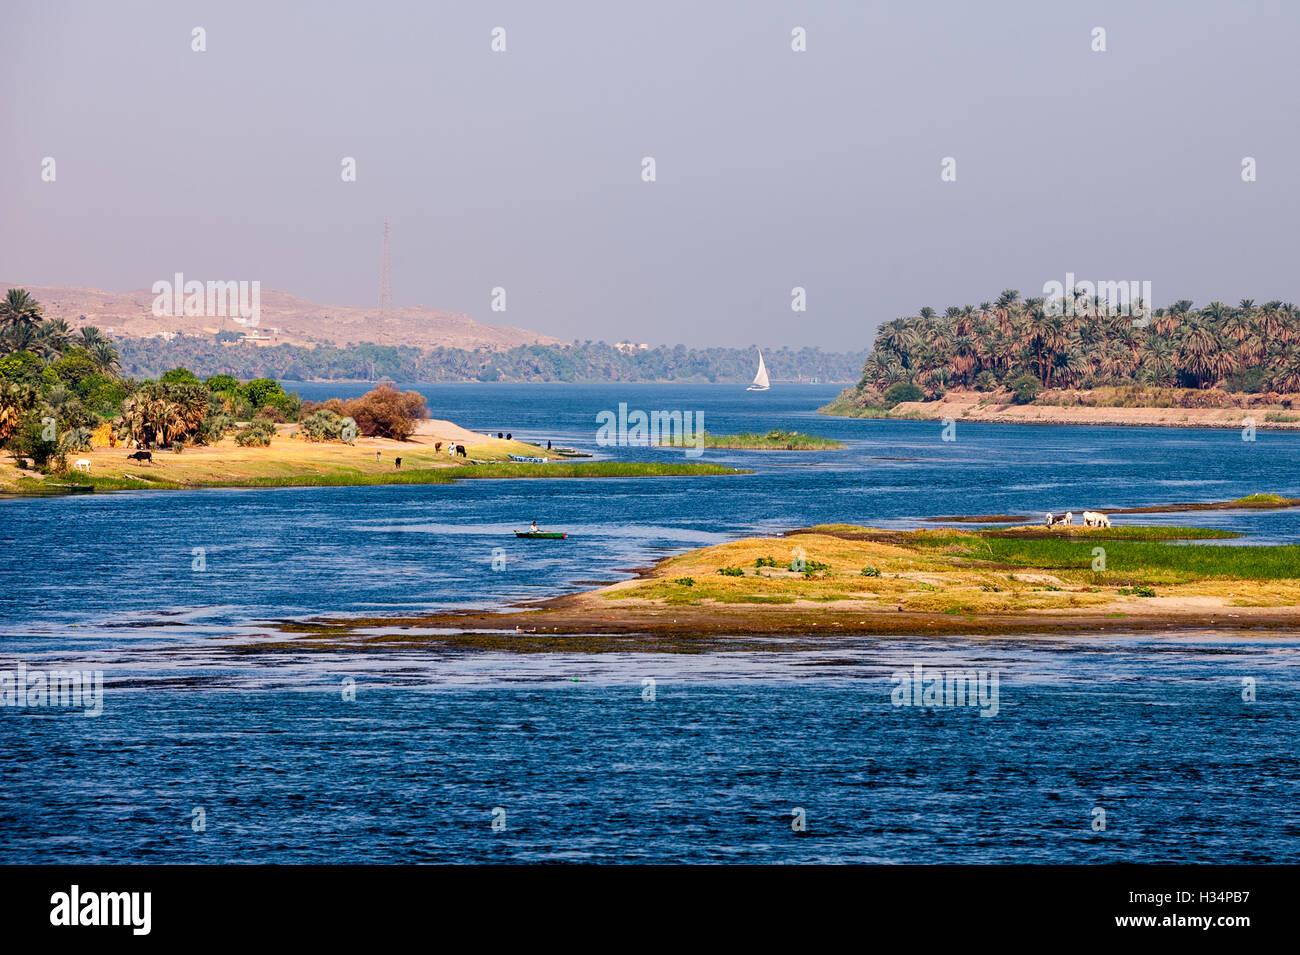 Egypt. Cruising the Nile from Kom Ombo to Luxor, passing Edfu and Esna. - Stock Image